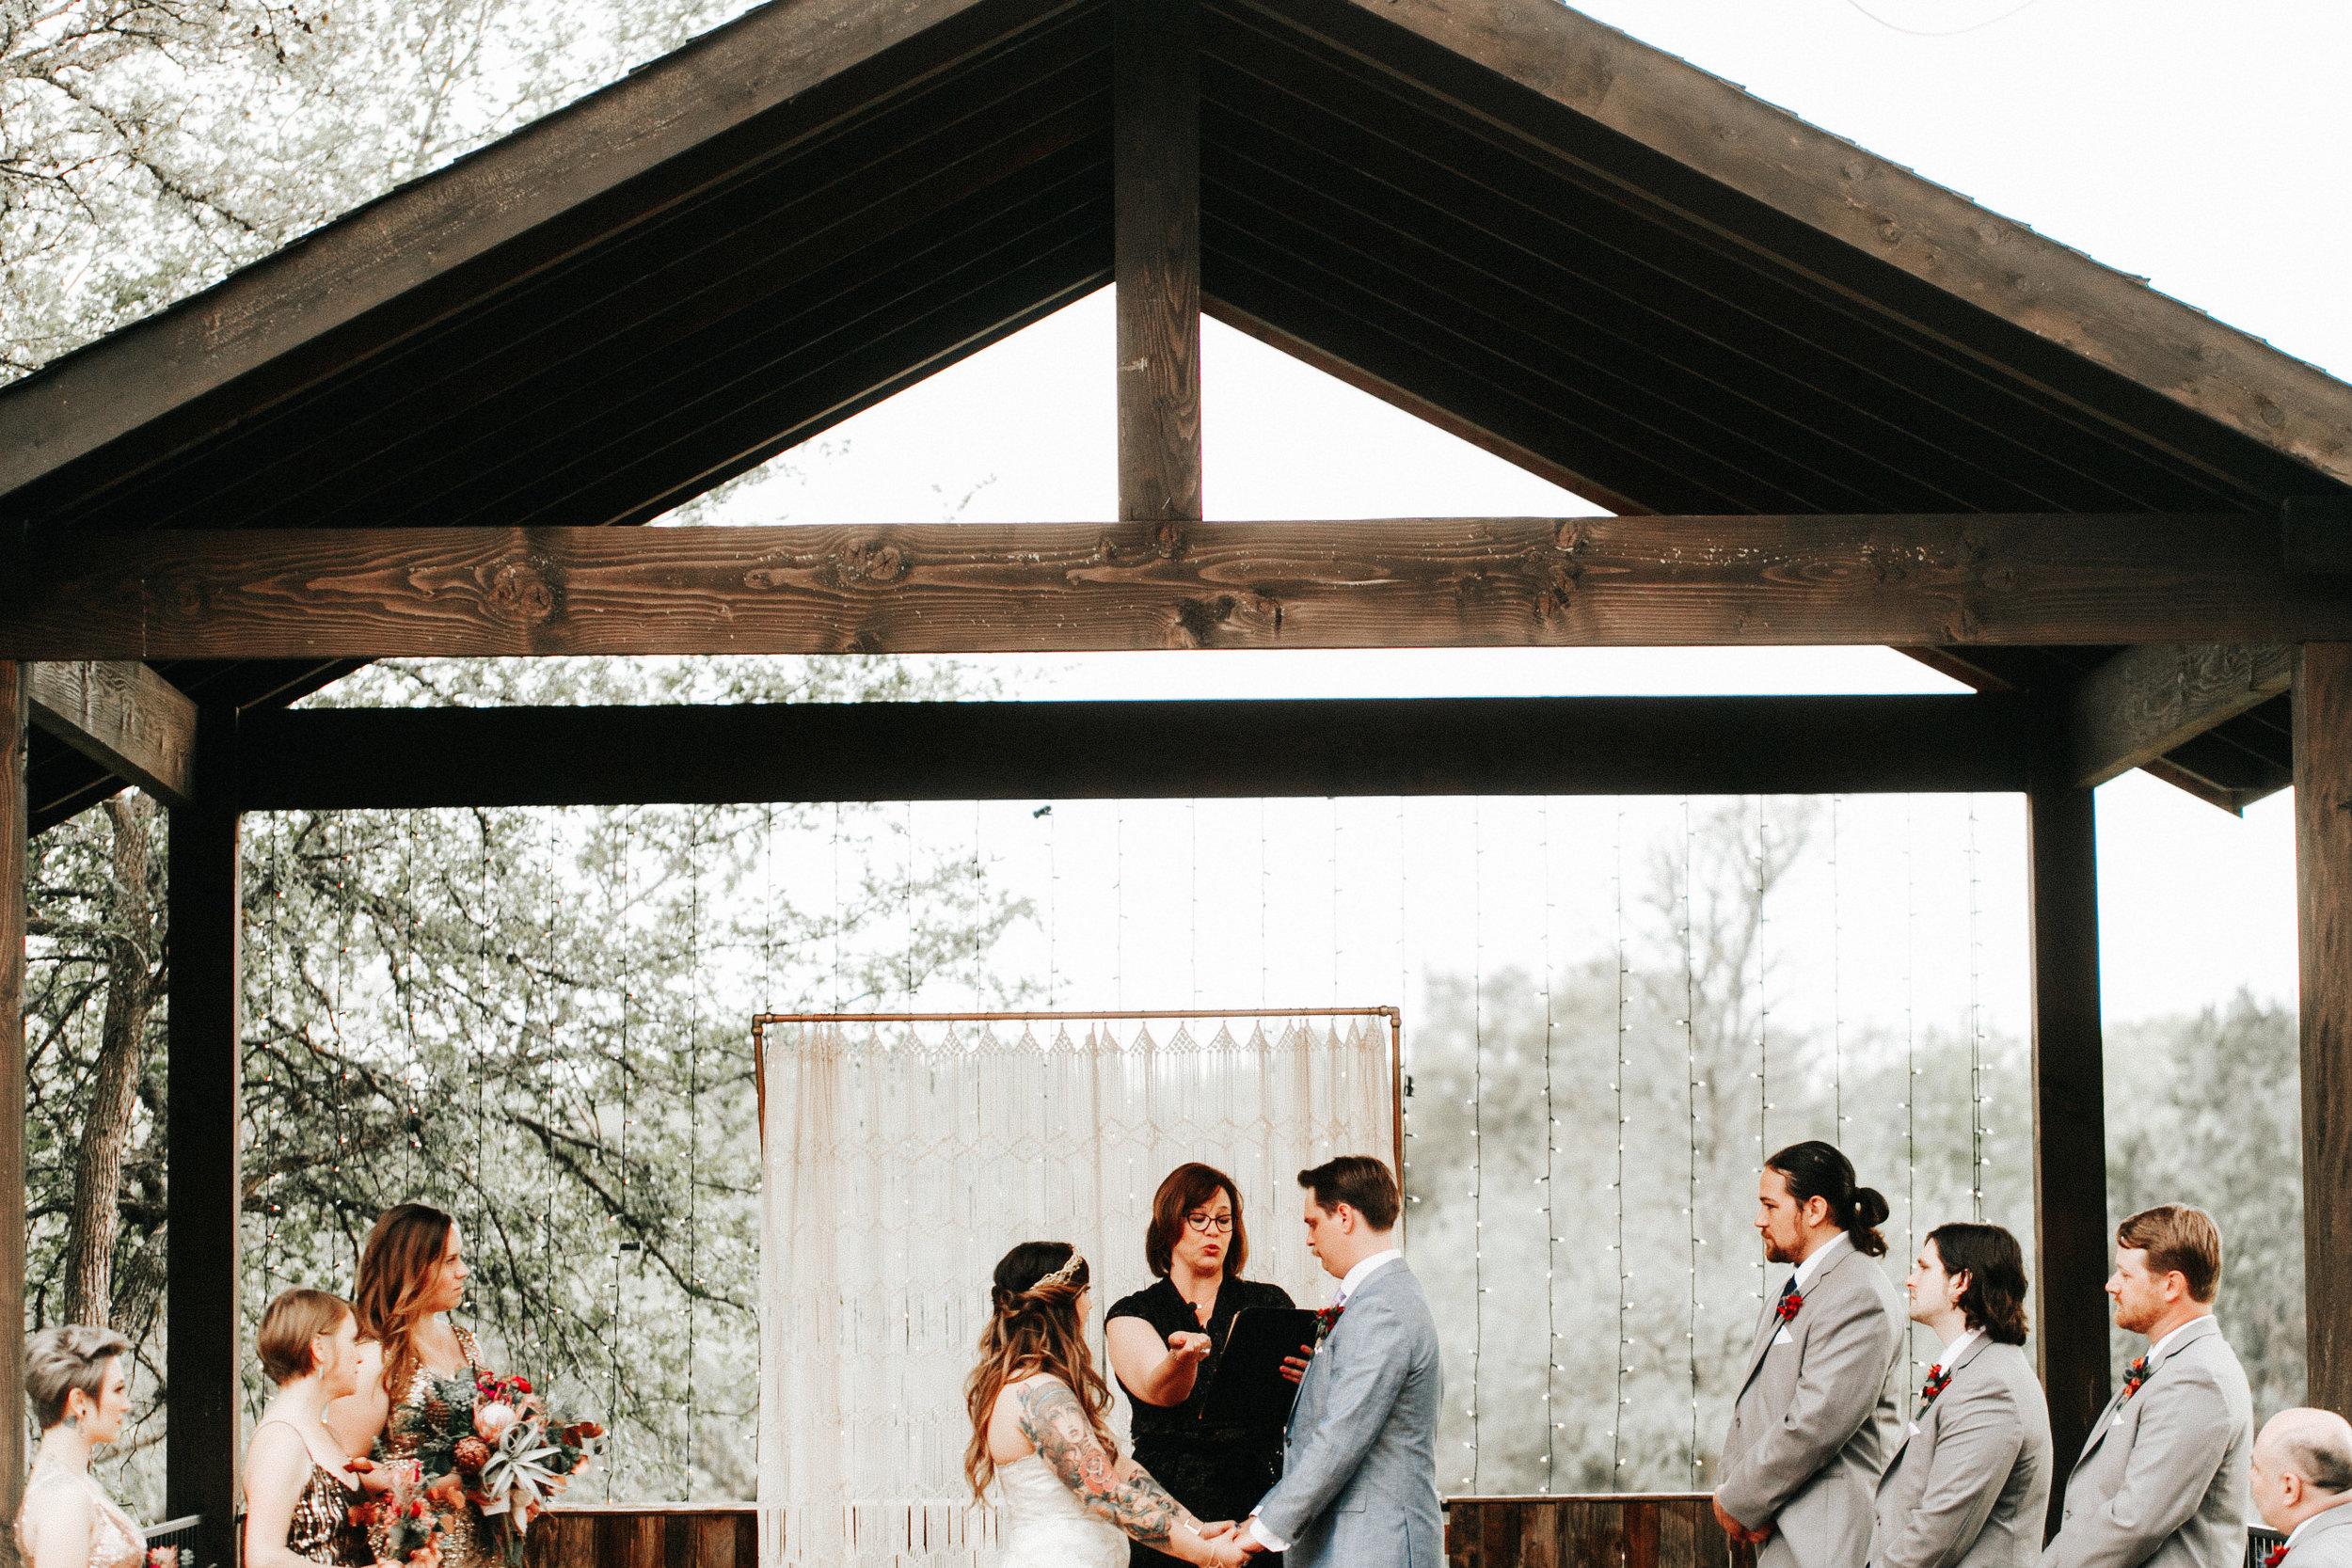 austin-wedding-photographer-49.jpg